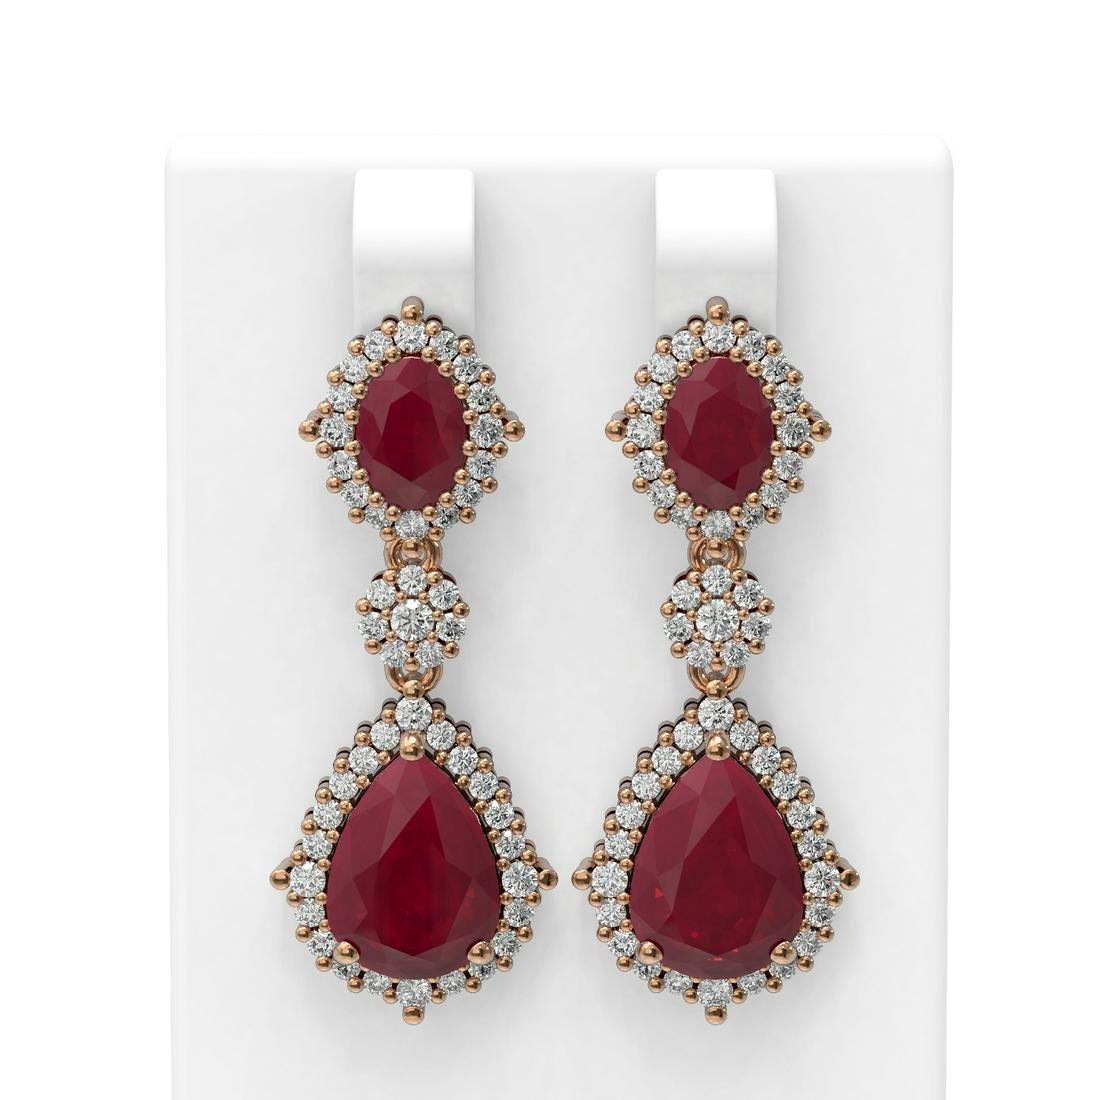 11.32 ctw Ruby & Diamond Earrings 18K Rose Gold -